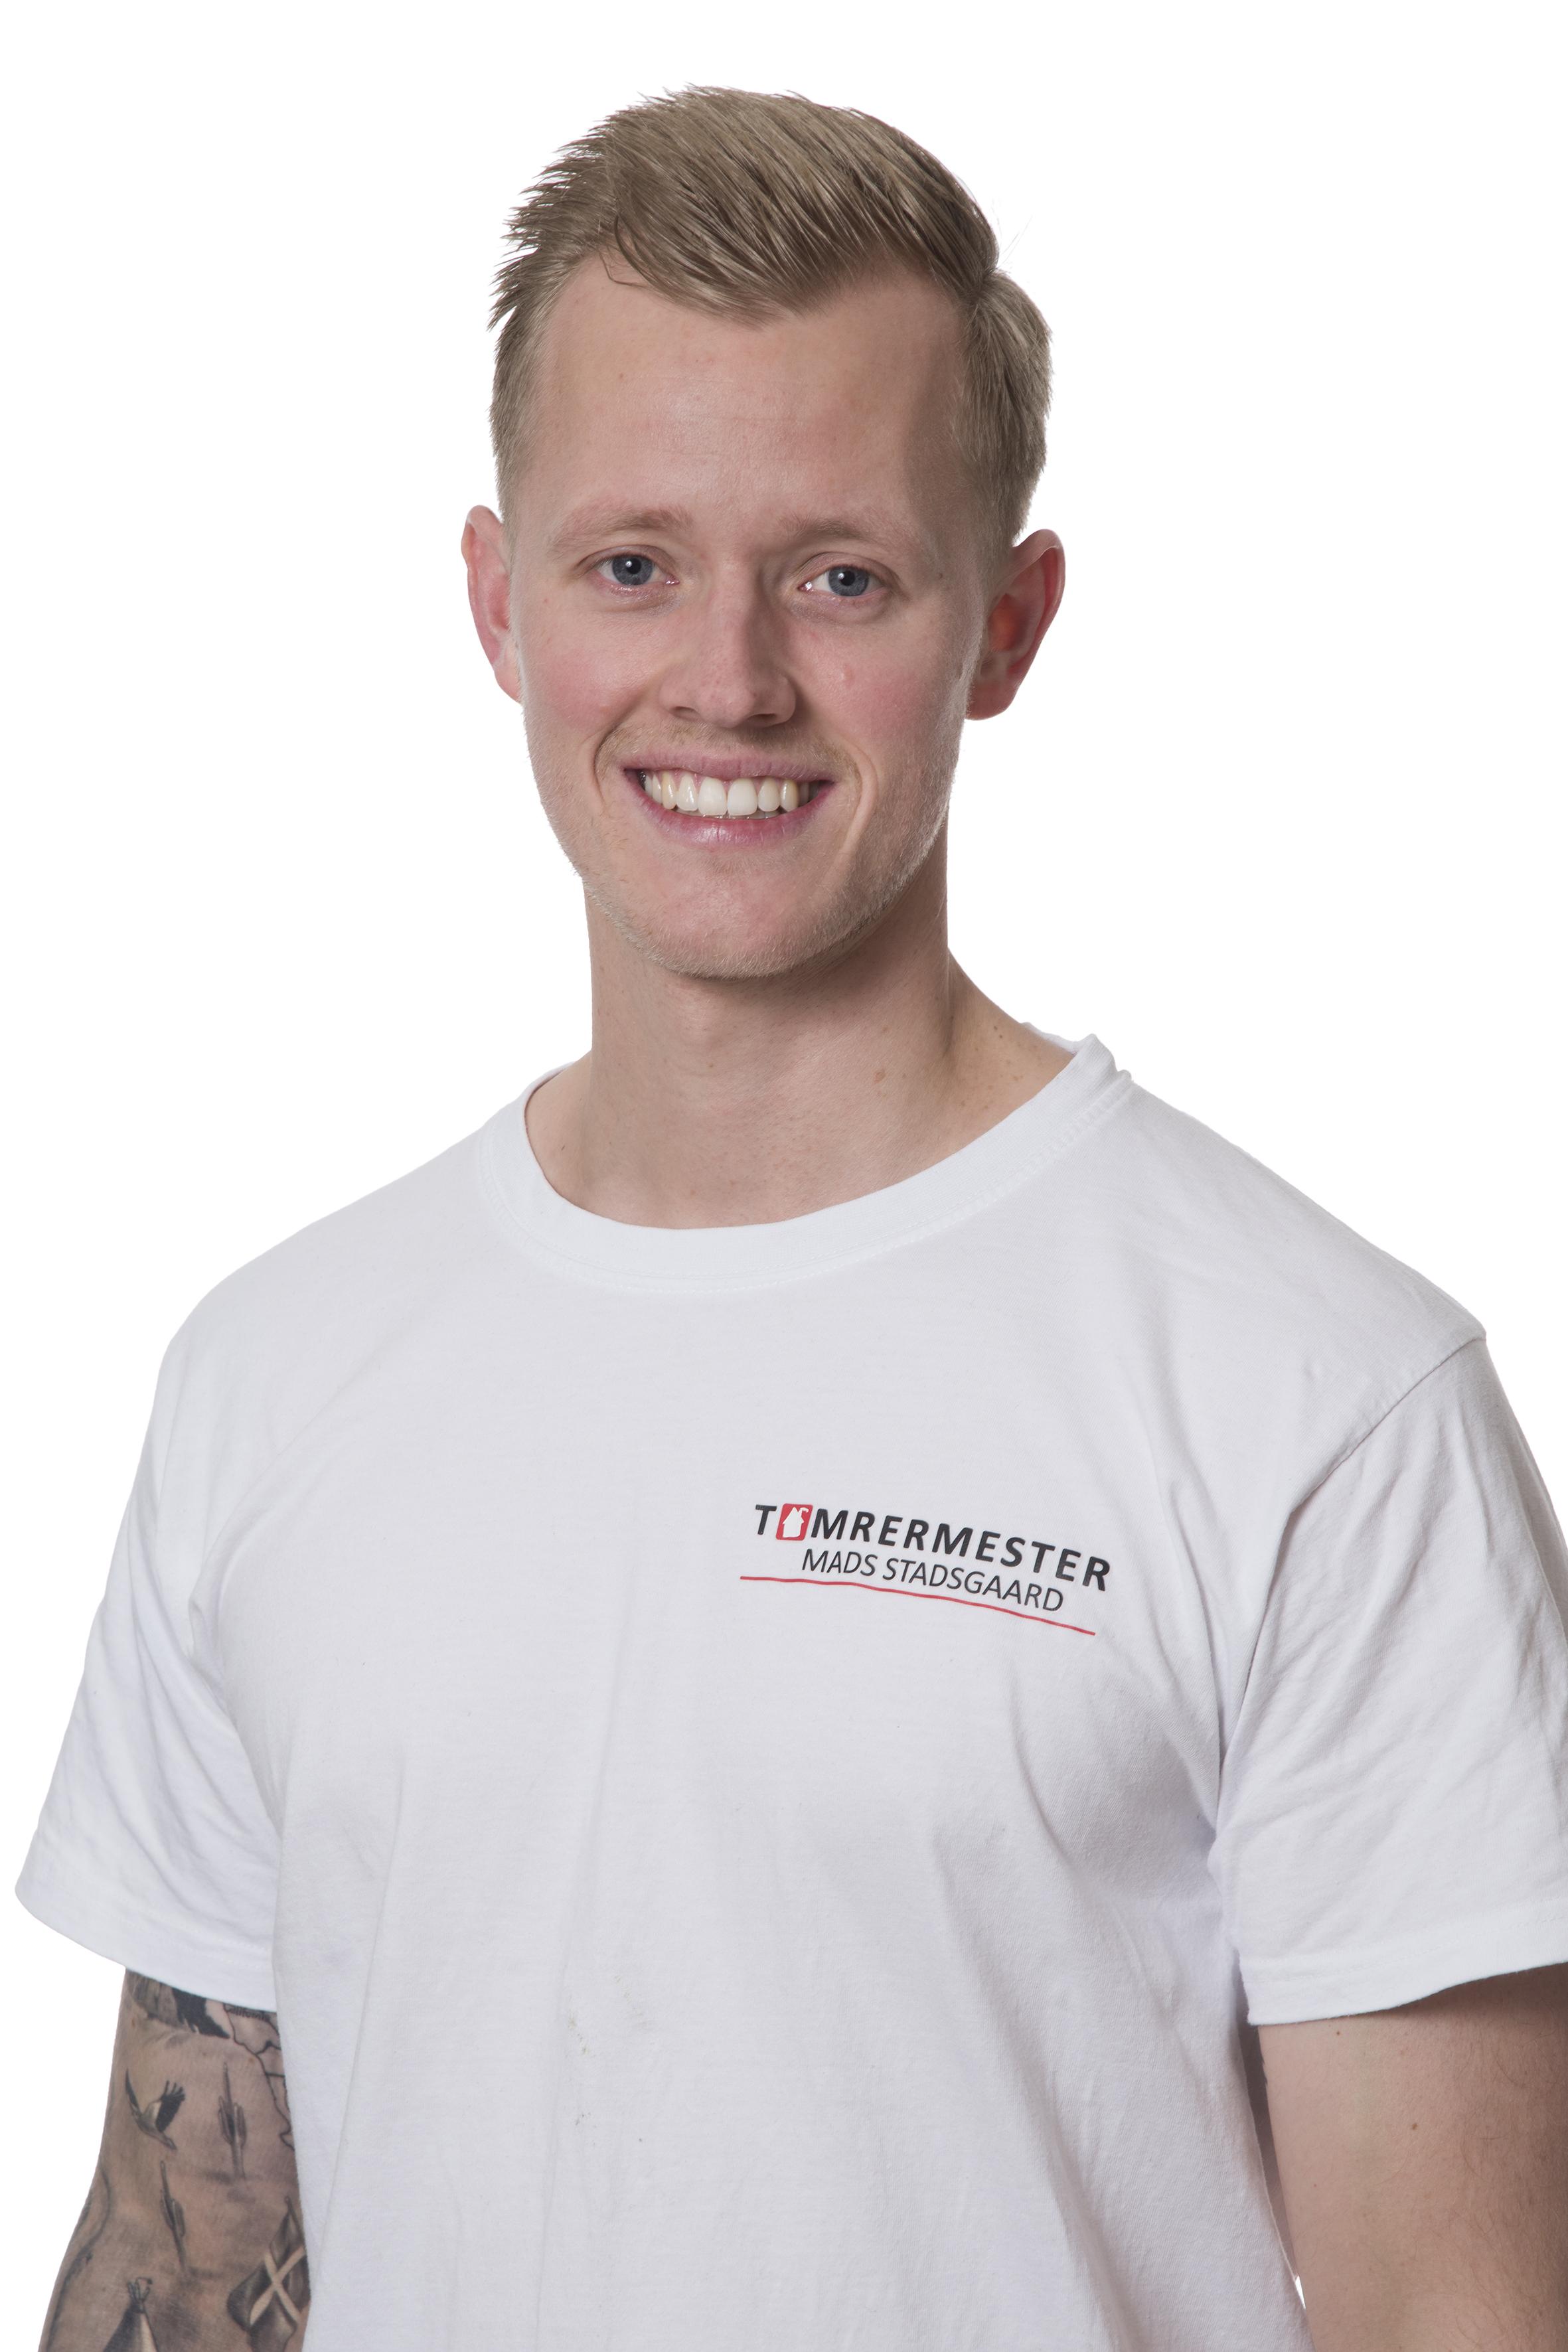 Kim Nørgaard Machon